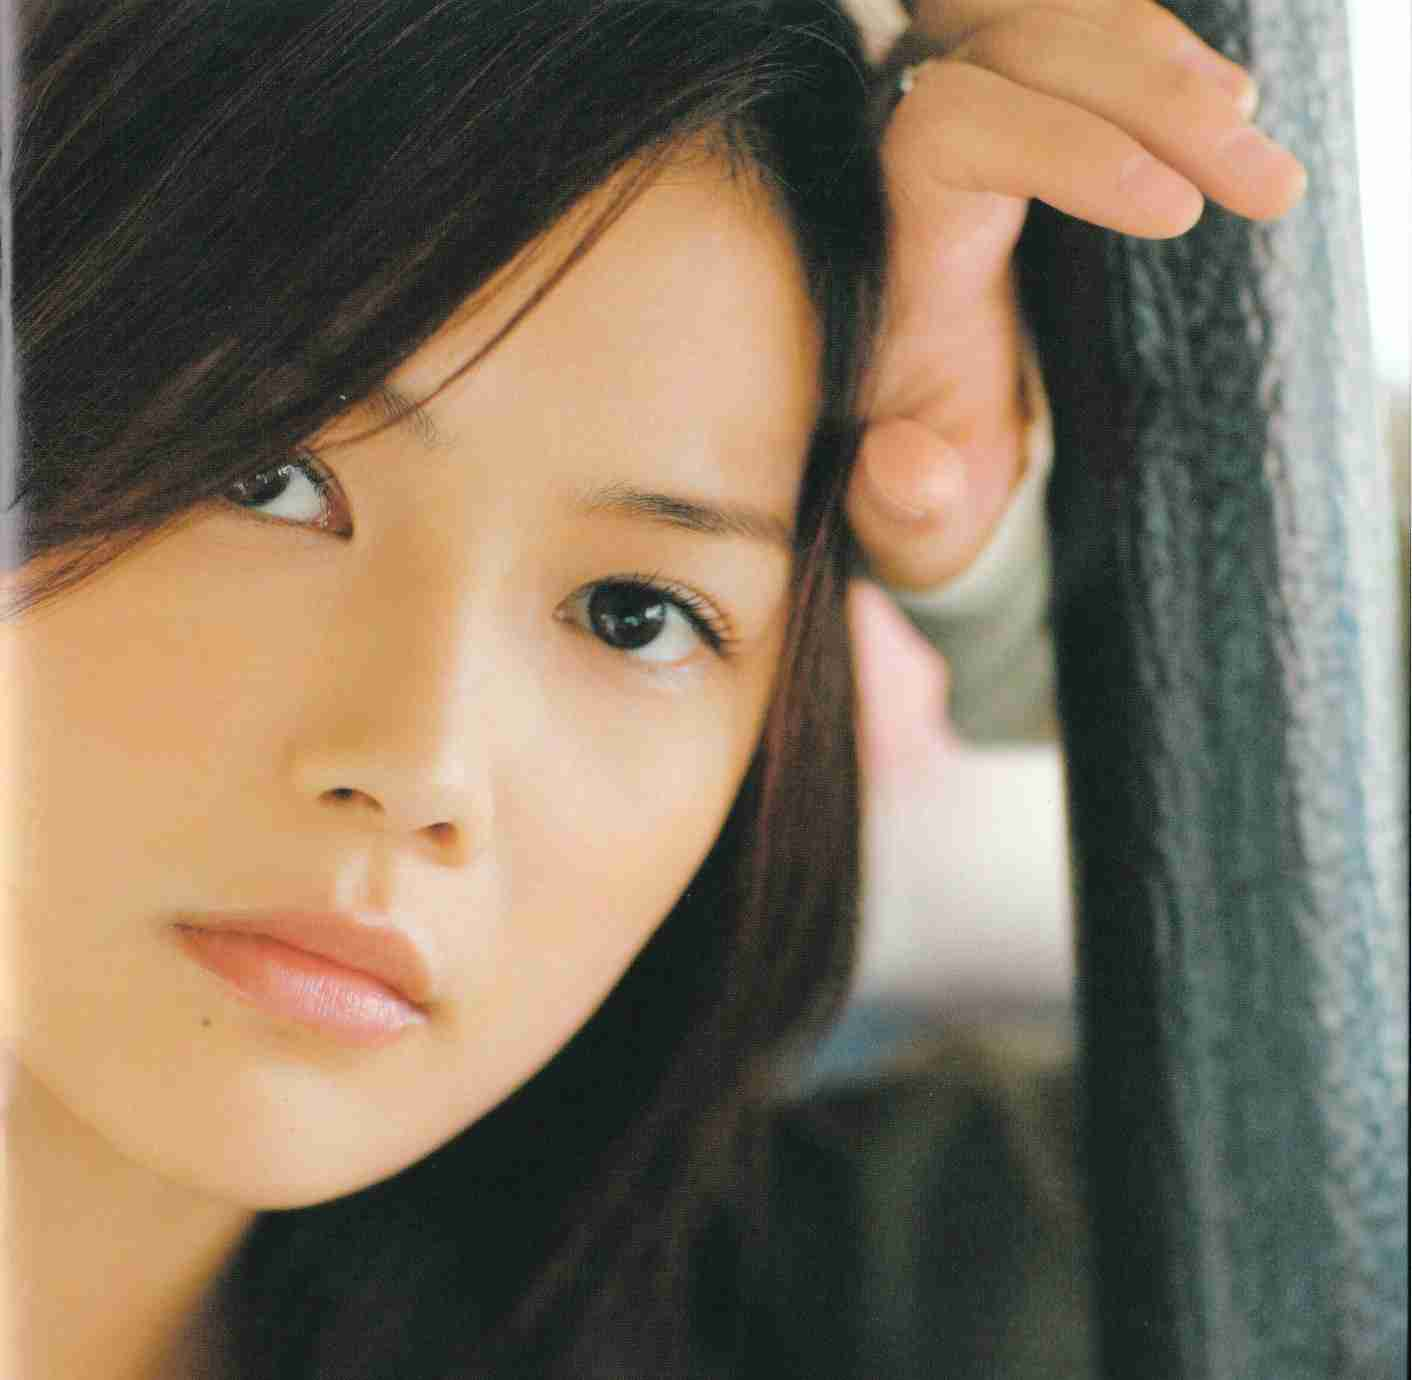 profile and career yui yoshioka on in the world of music